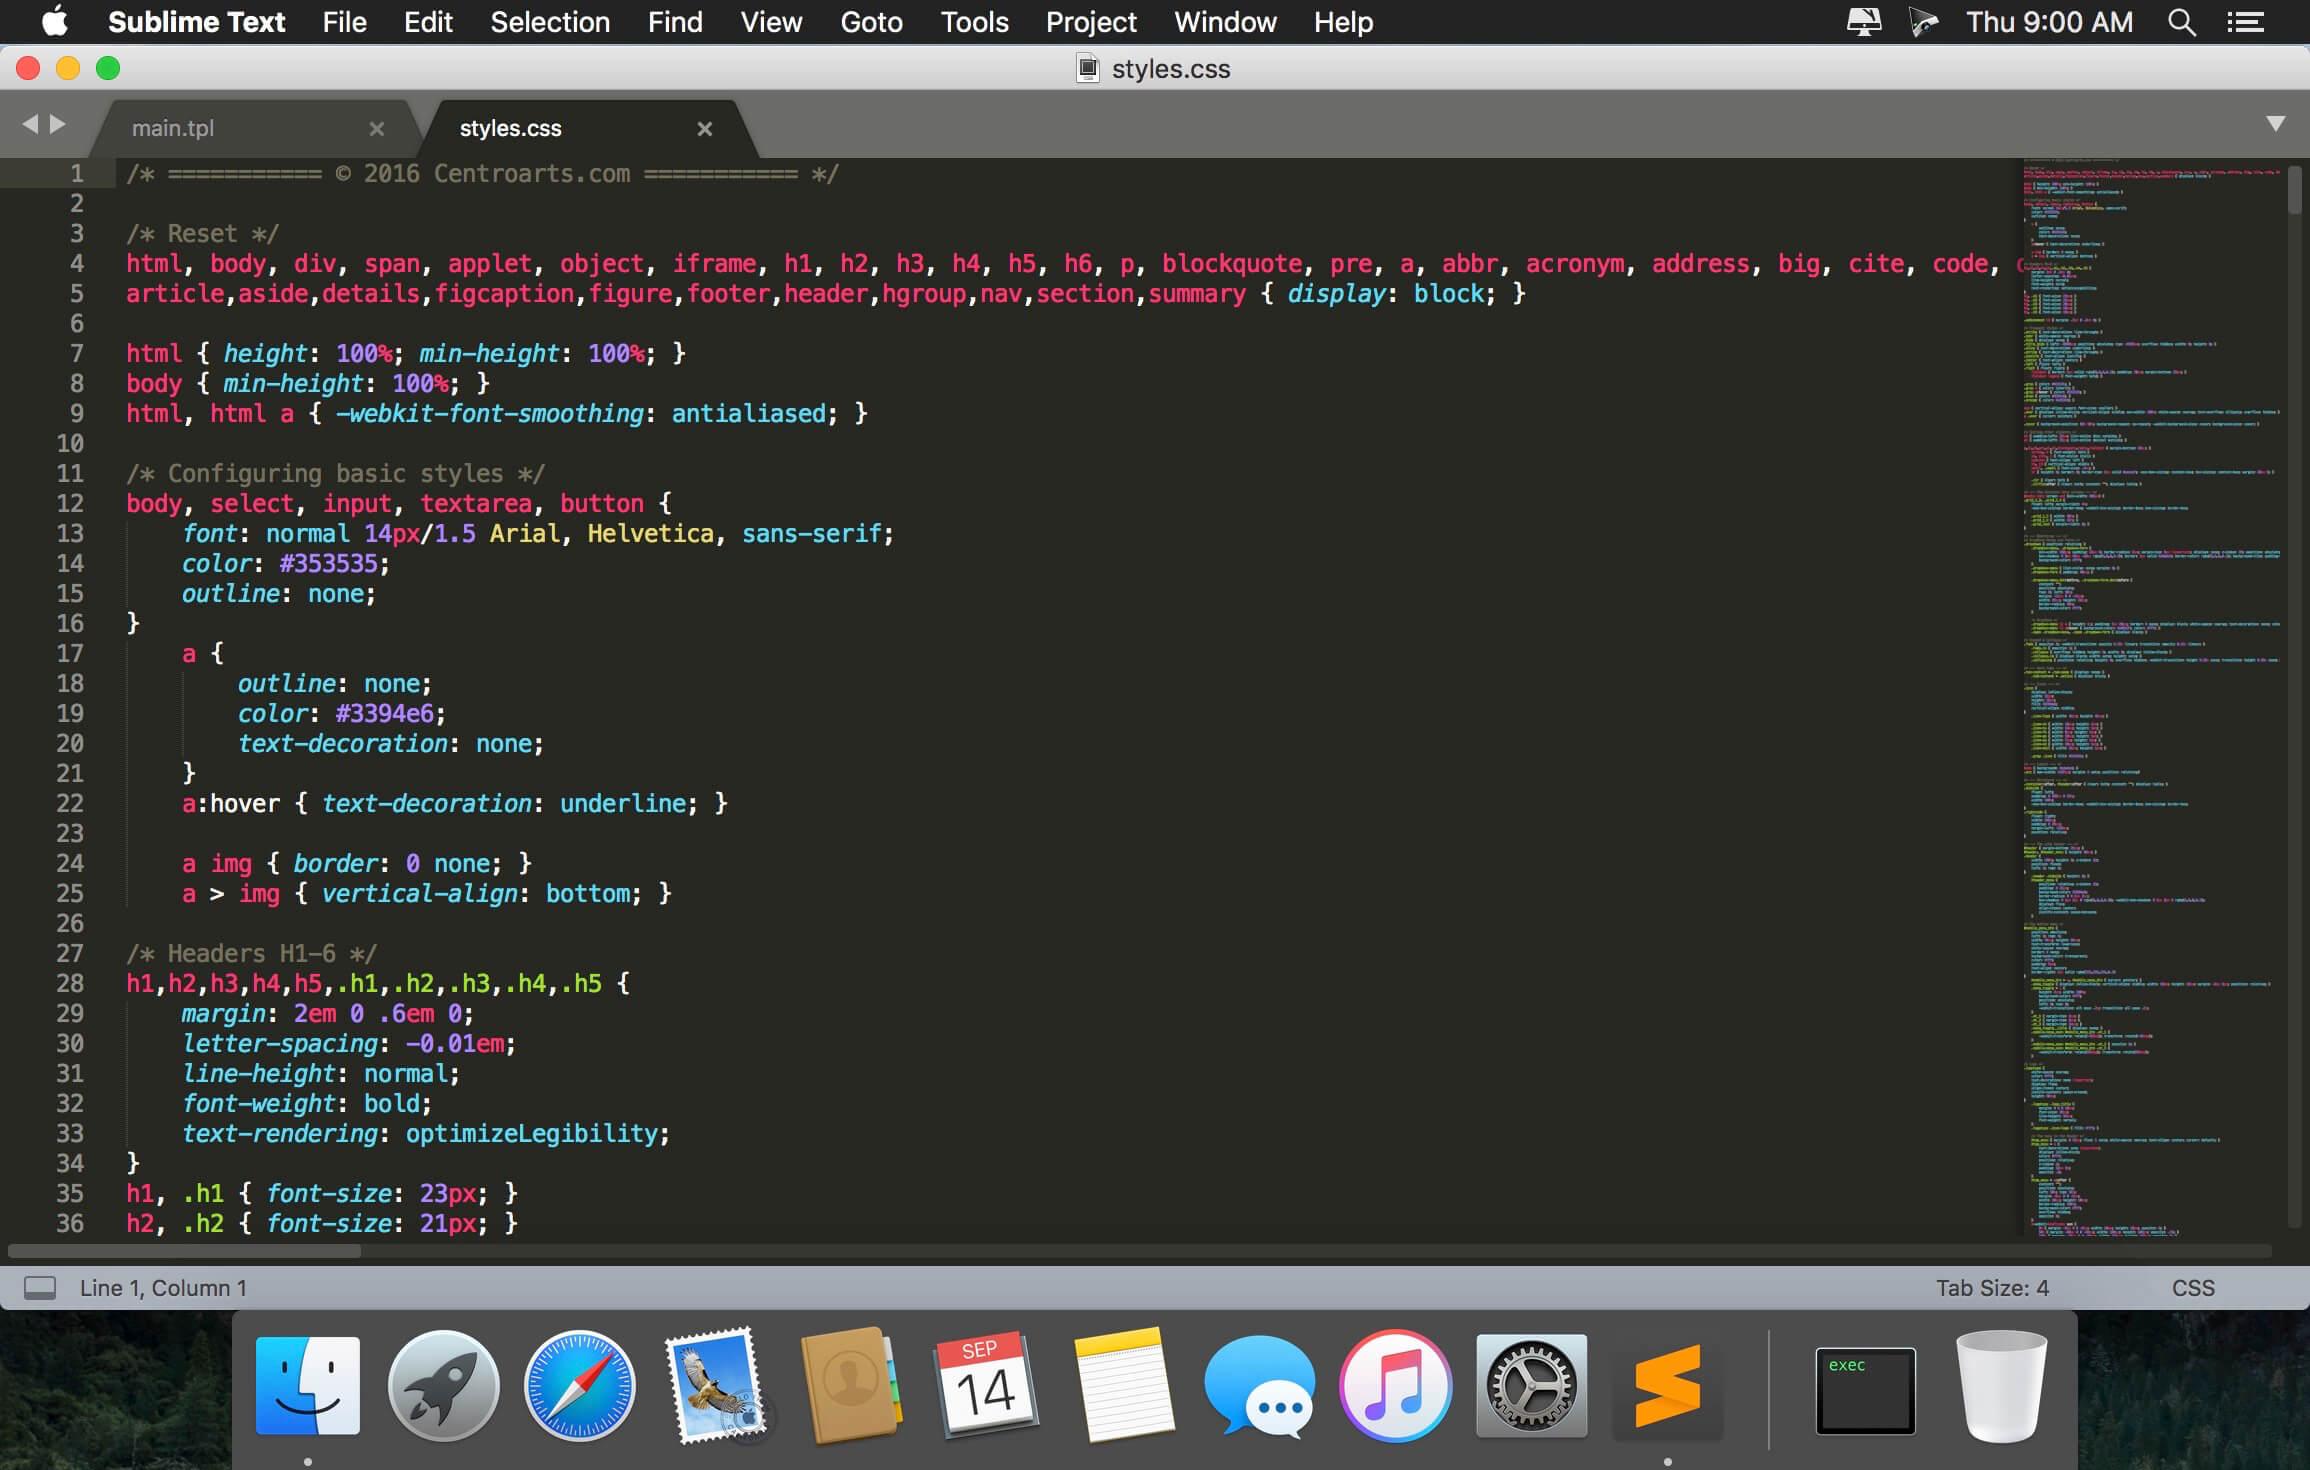 Sublime-Text-4.0-for-Mac-Torrent-Full-Setup-Download